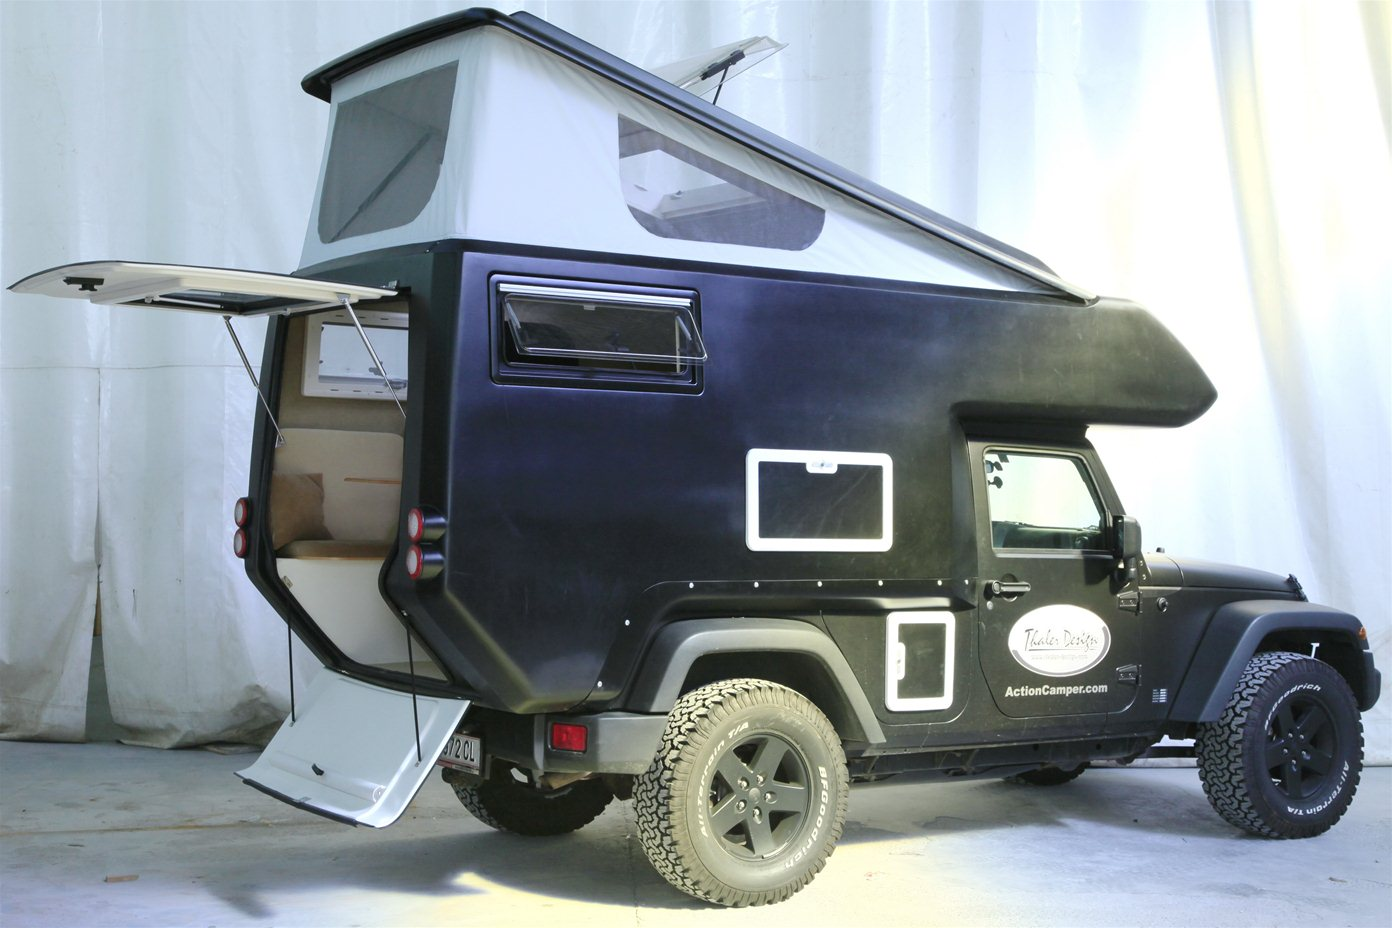 Jeep Wrangler Action Camper RV - autoevolution